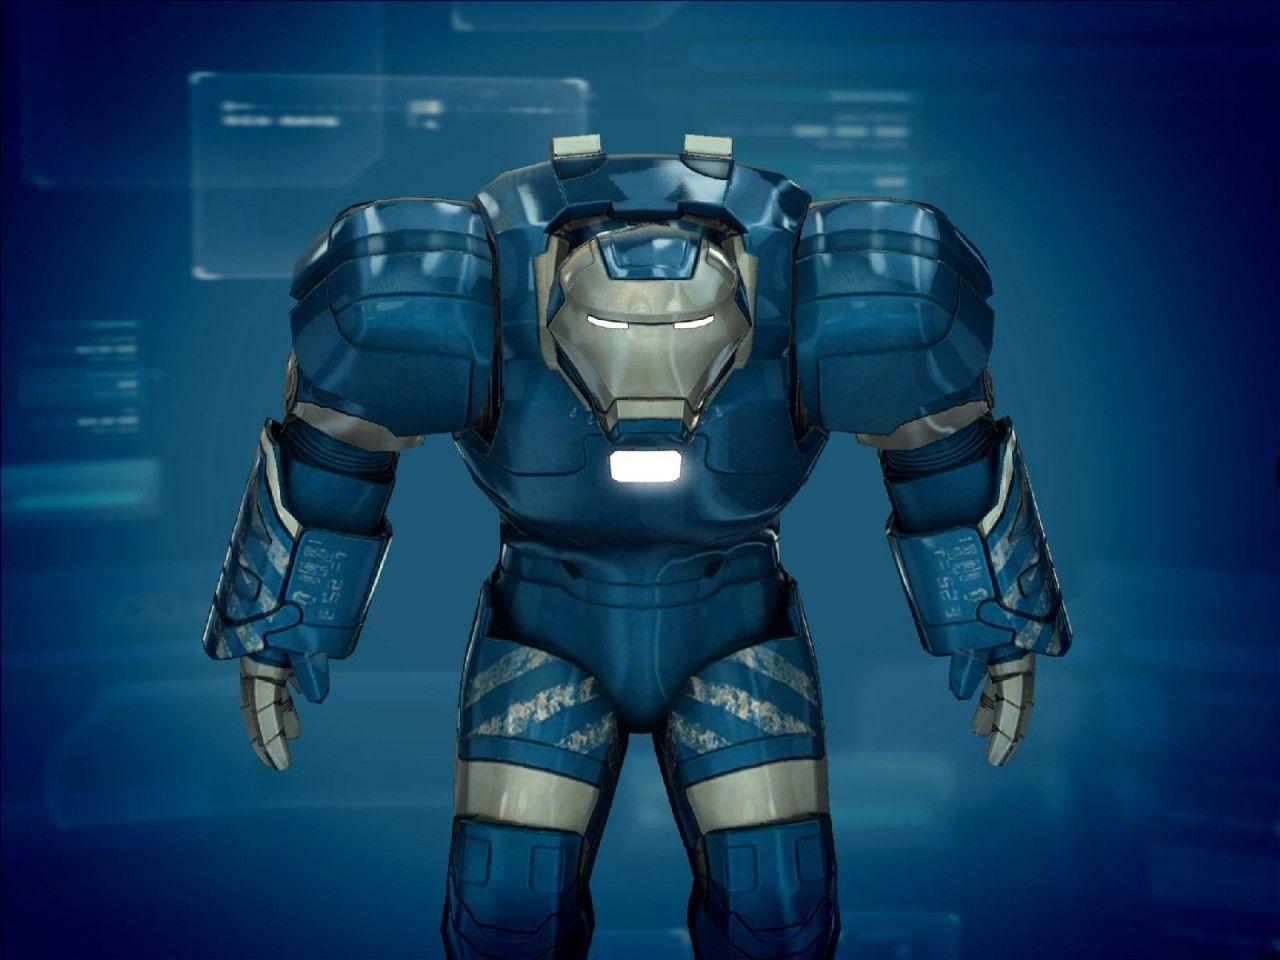 iron man mark 38 igor ironman 3 - Jeux D Iron Man